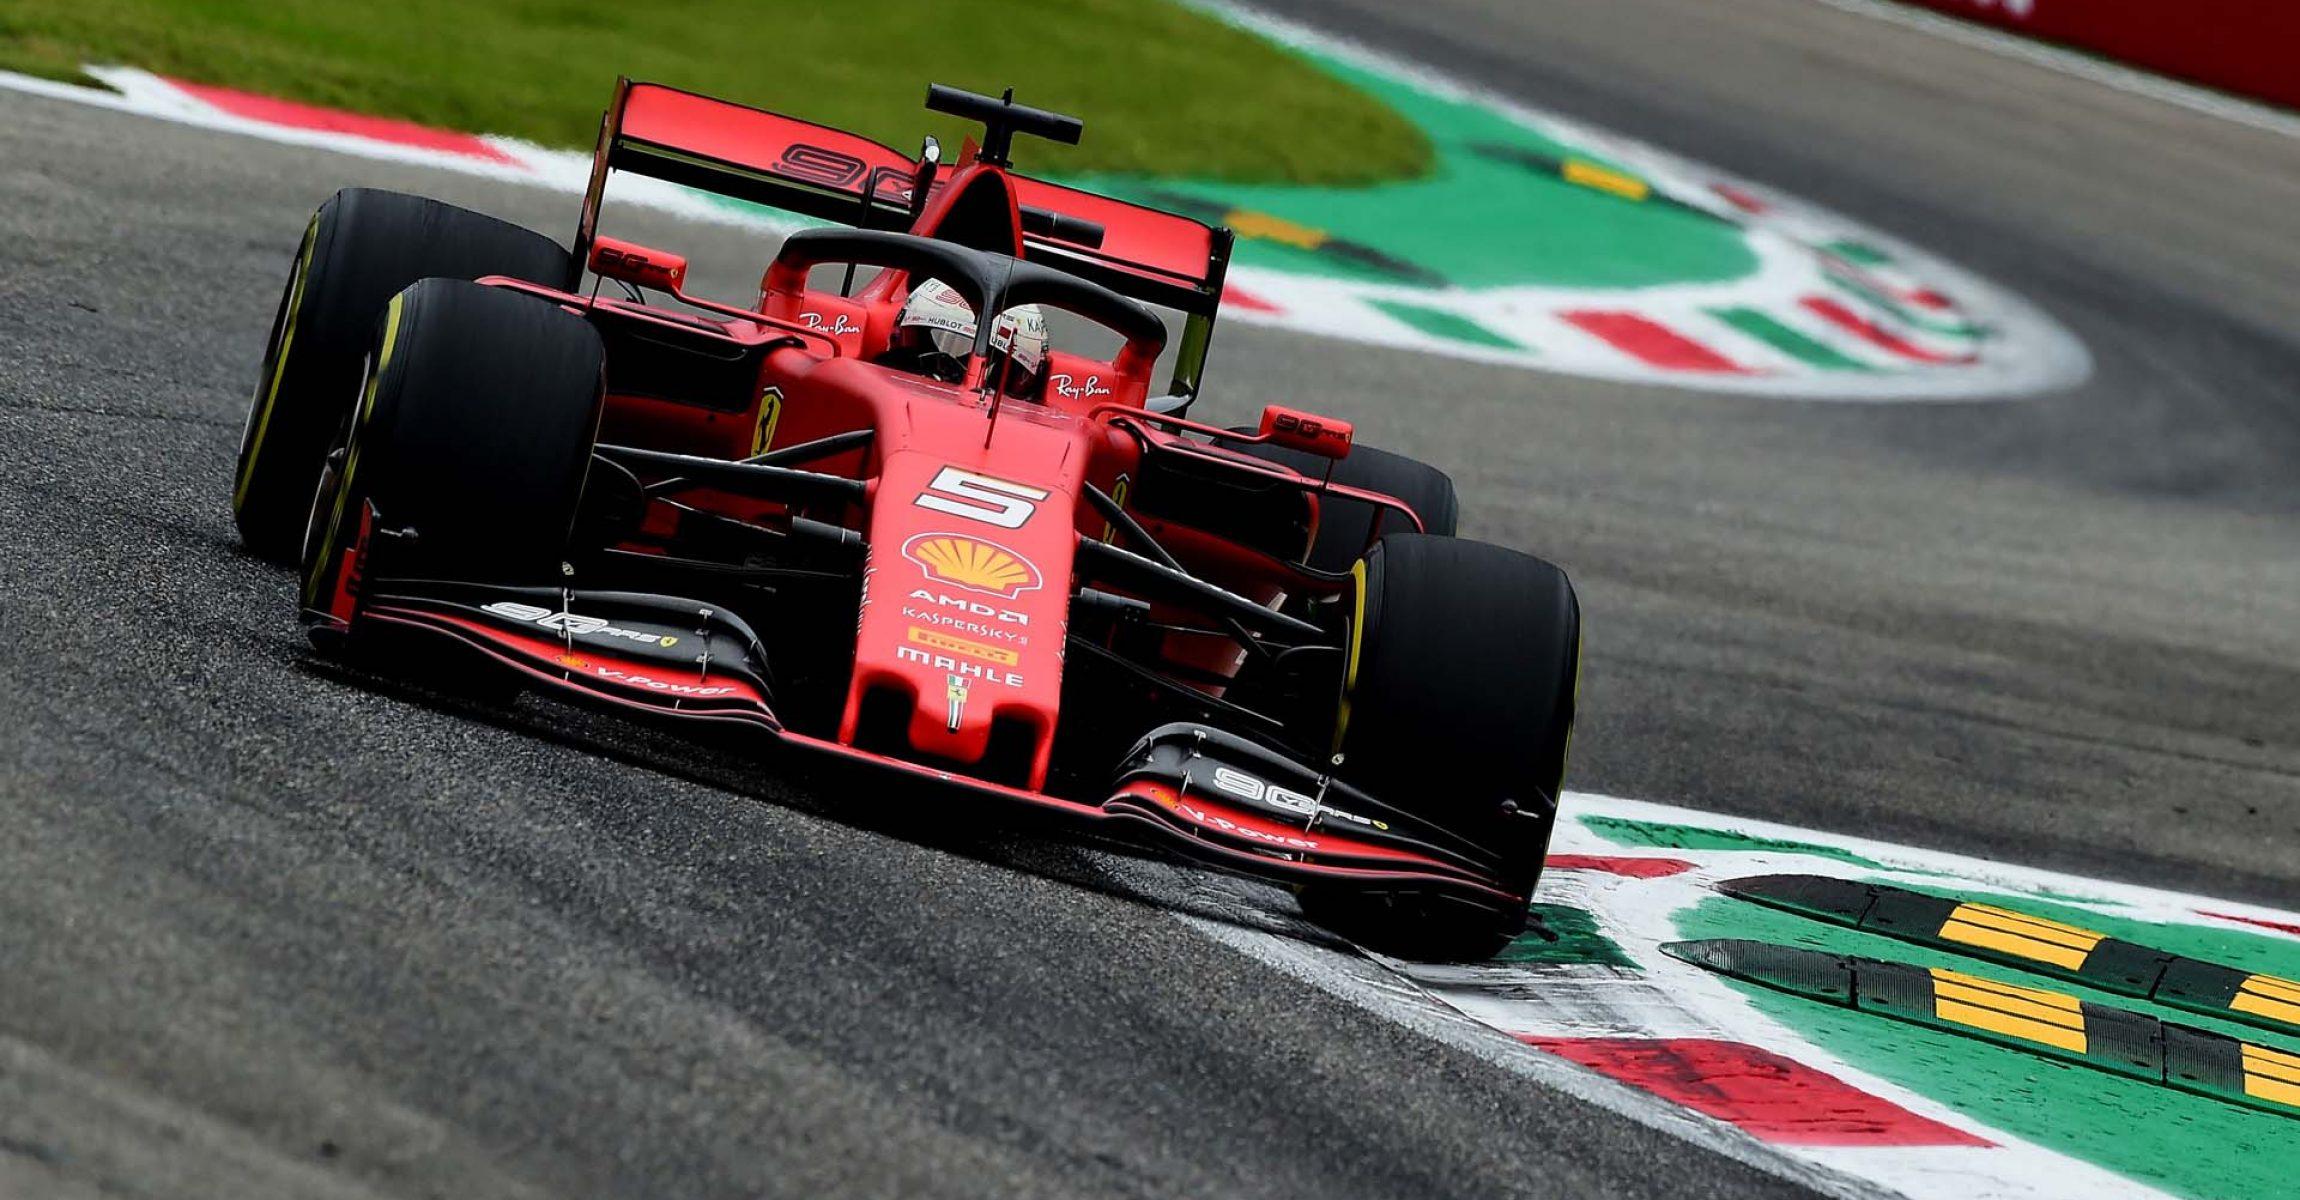 GP ITALIA  F1/2019 -  VENERDI 06/09/2019   credit: @Scuderia Ferrari Press Office Italy, Italian Grand Prix 2019, Monza,  Sebastian Vettel Ferrari